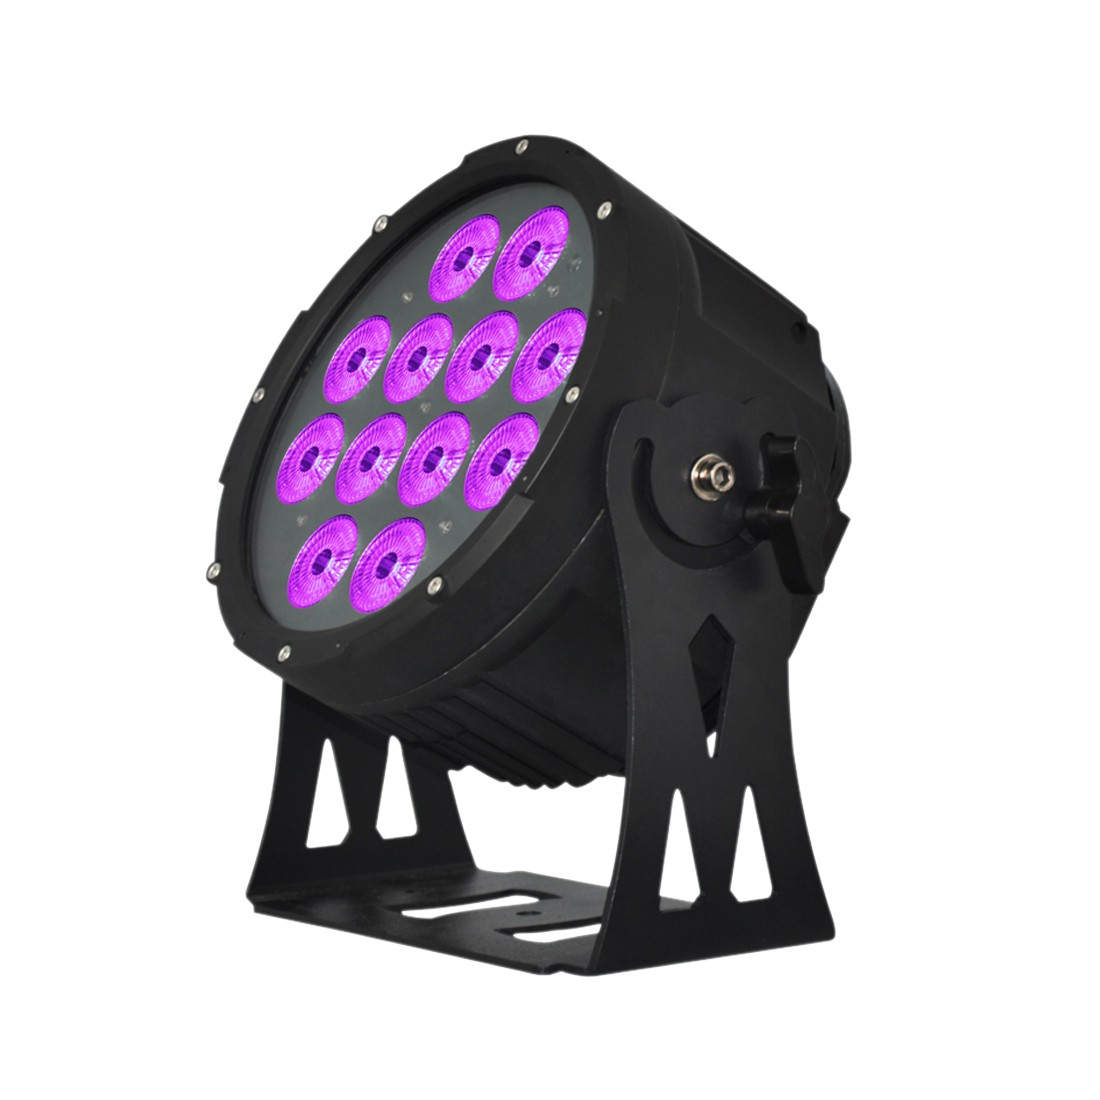 Elation SIXPAR 200IP 12 x 12-Watt 6-In-1 RGBAW Plus UV LEDs Dual Yoke/Floor Stand Par Fixture (SIX013)